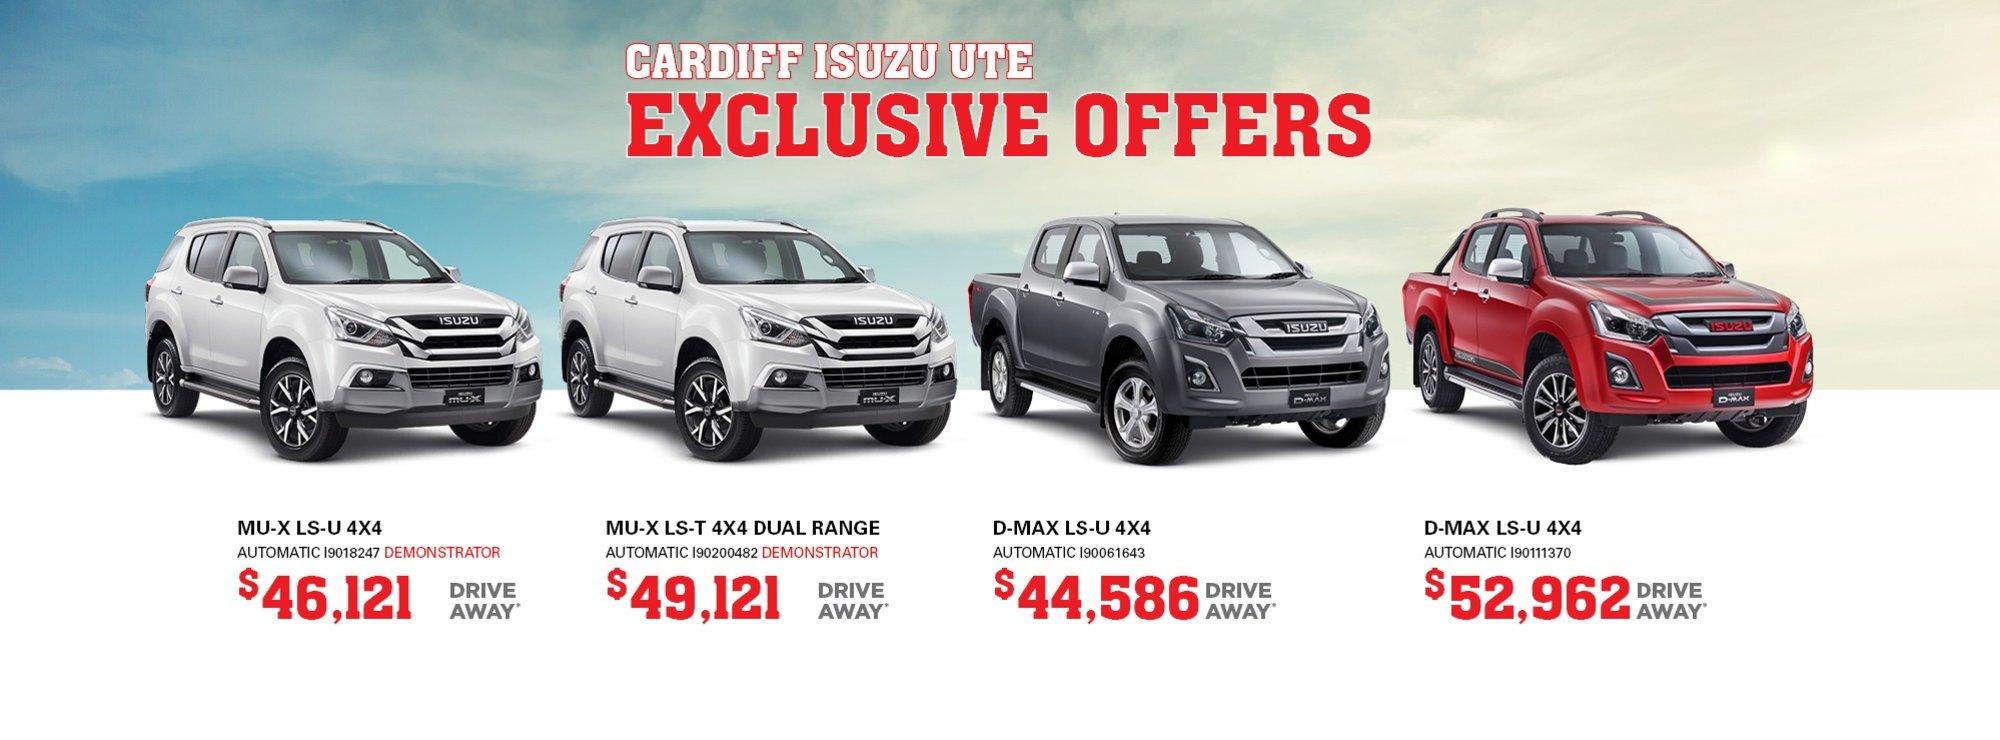 cardiff isuzu ute exclusive offers